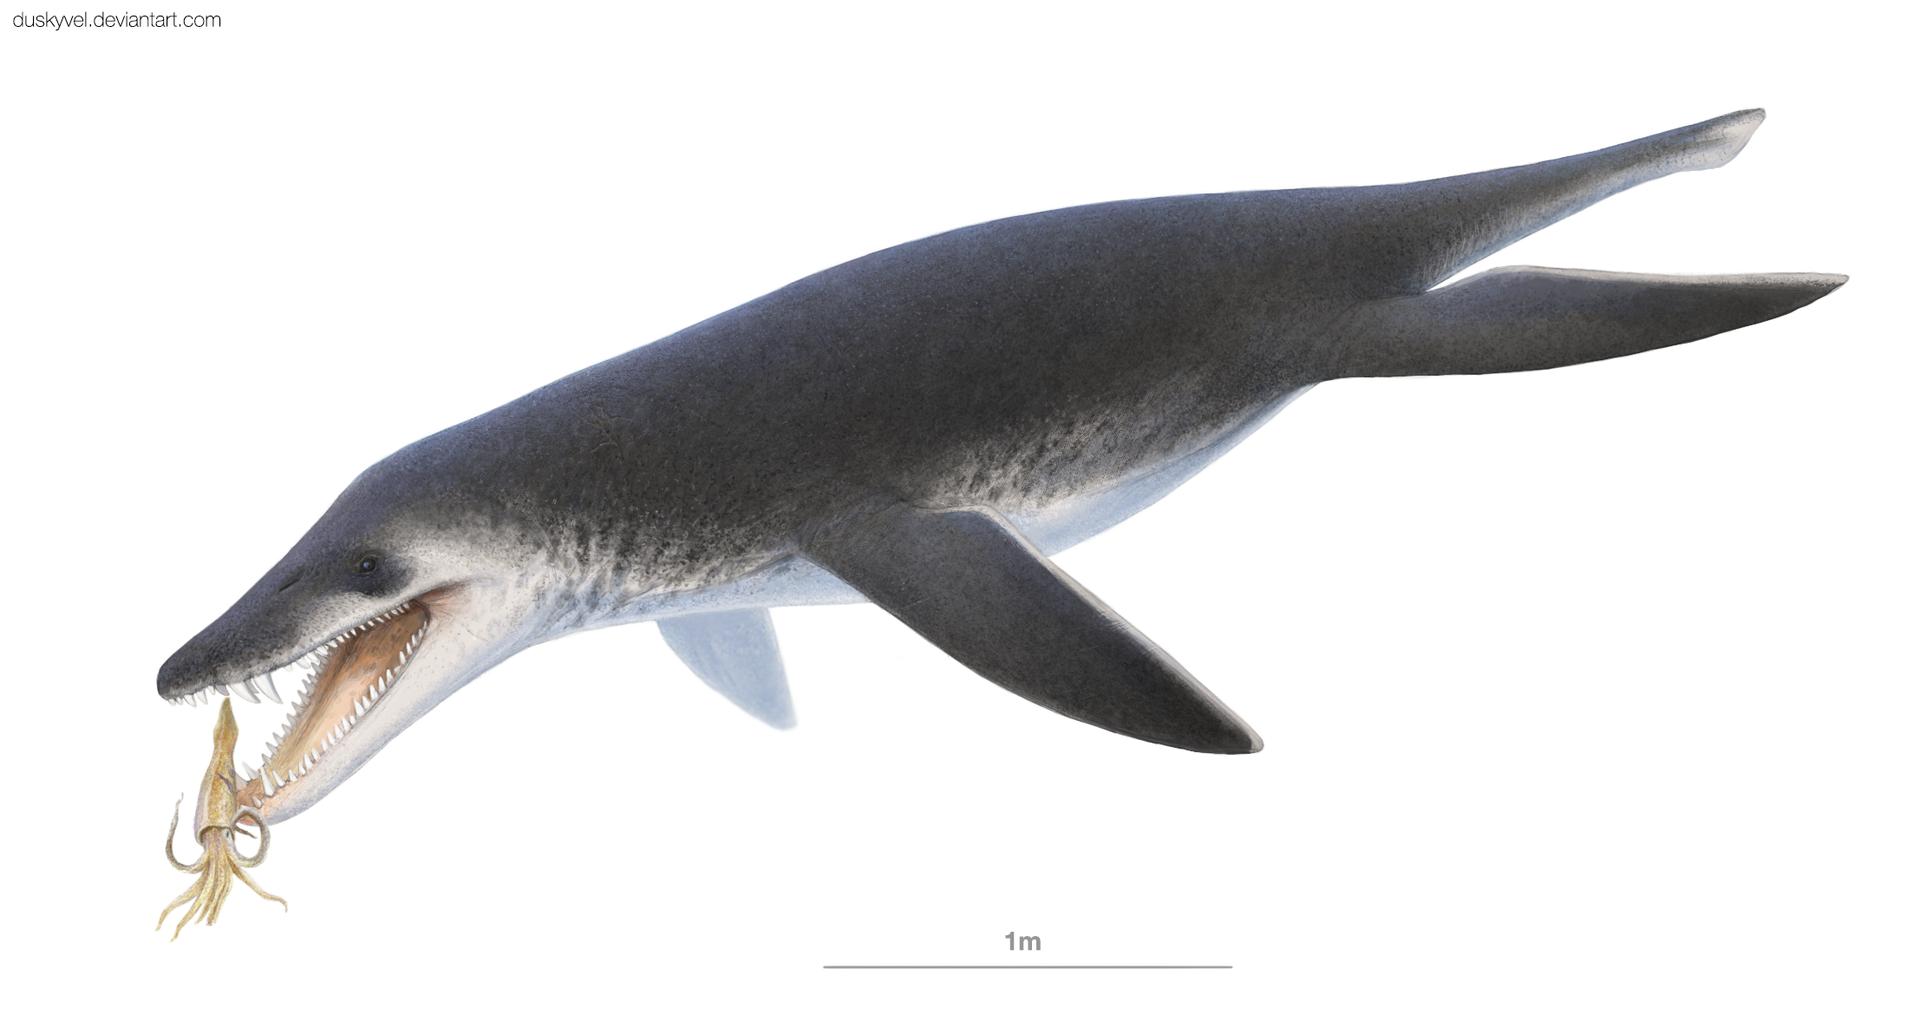 Acostasaurus